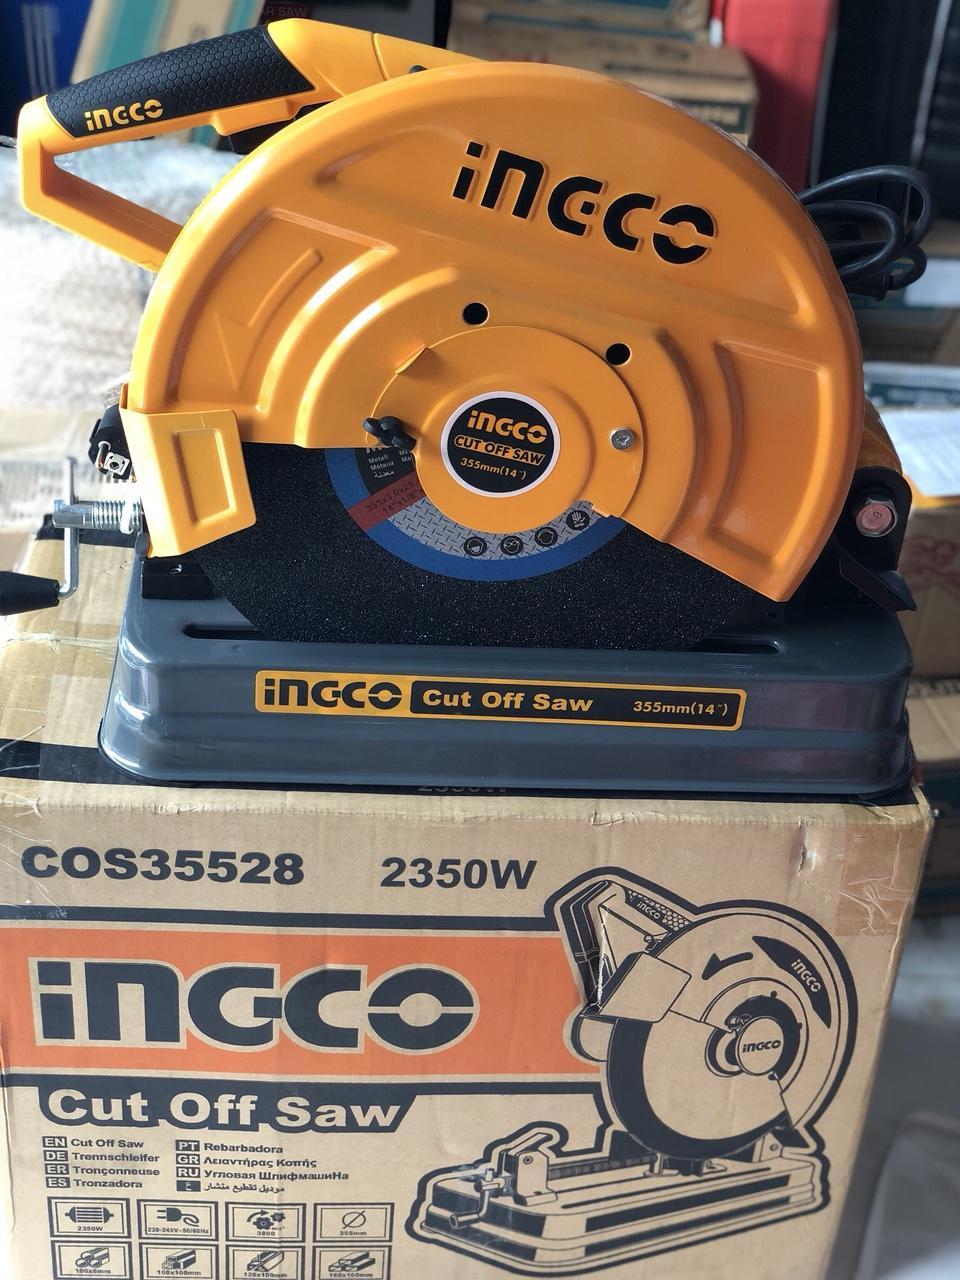 2350W-355mm Máy cắt sắt/kim loại INGCO COS35528